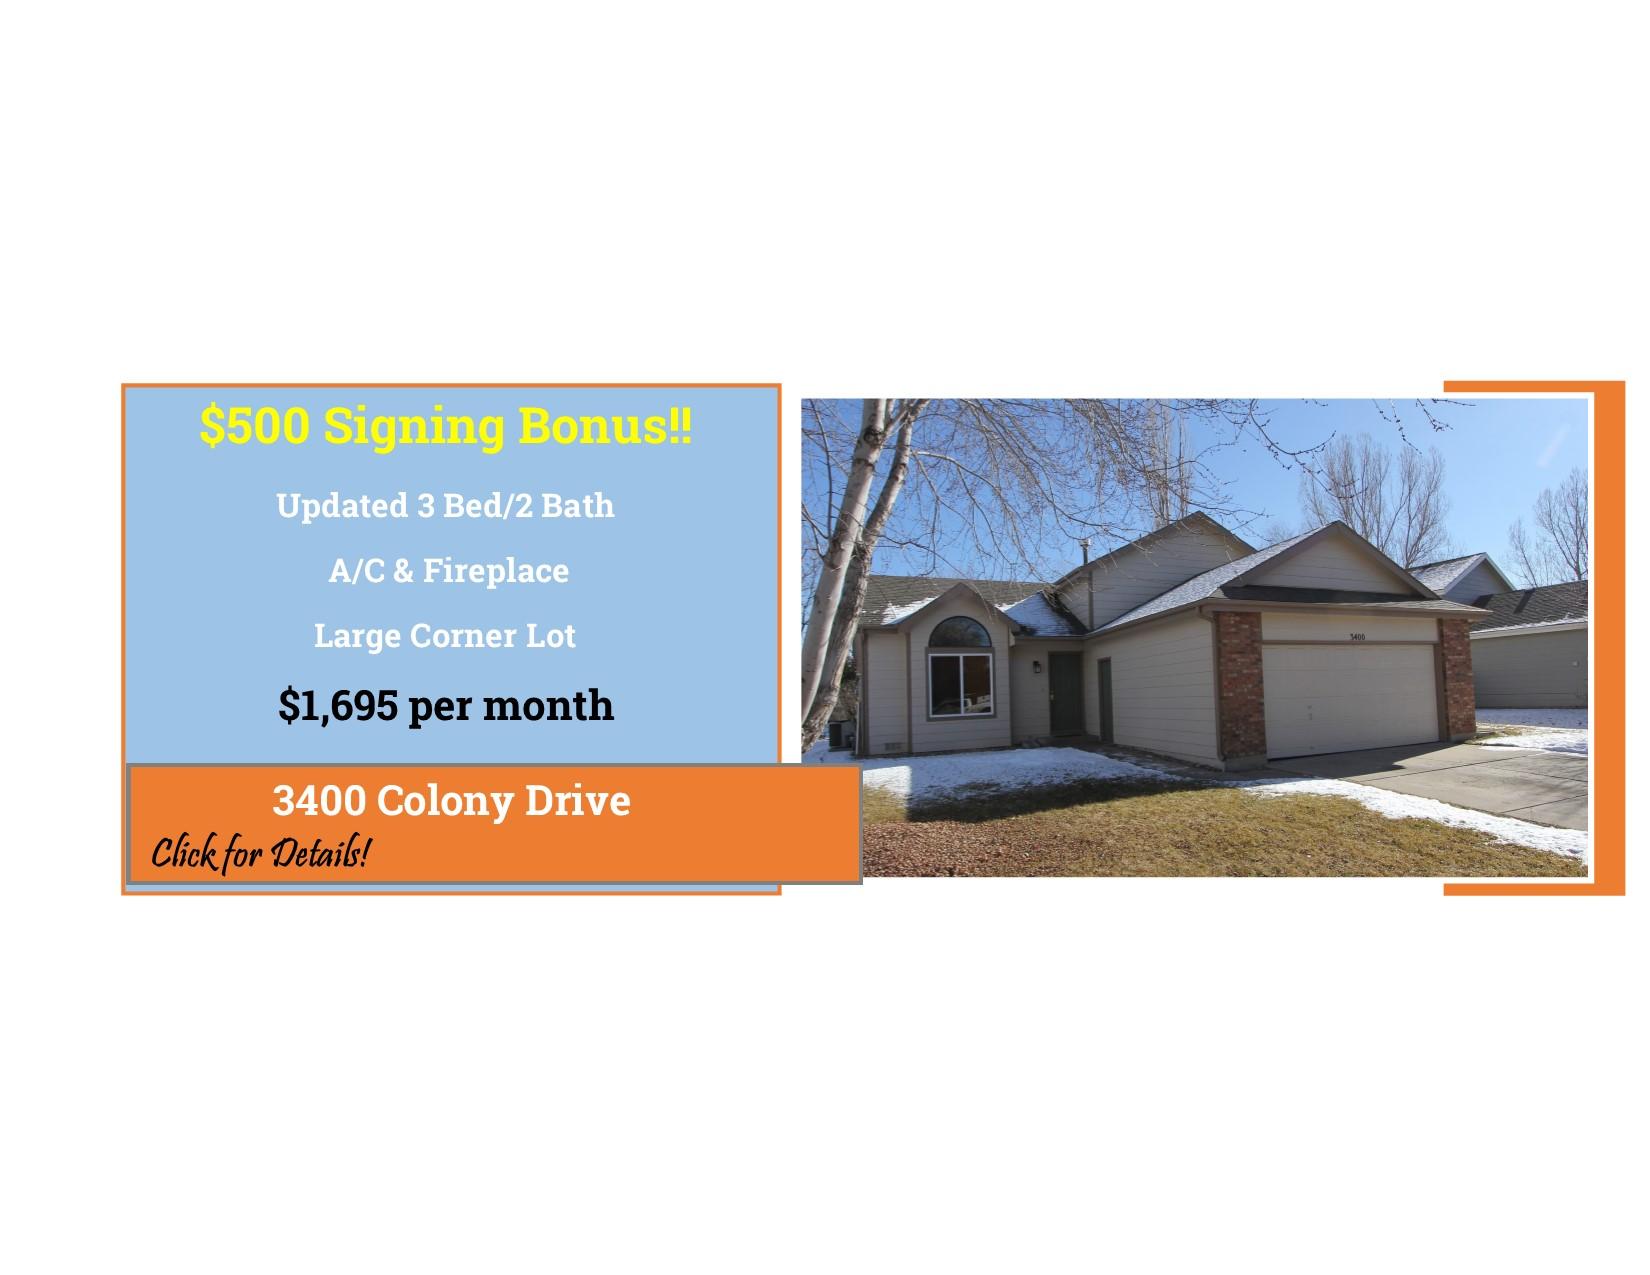 3400 Colony Drive